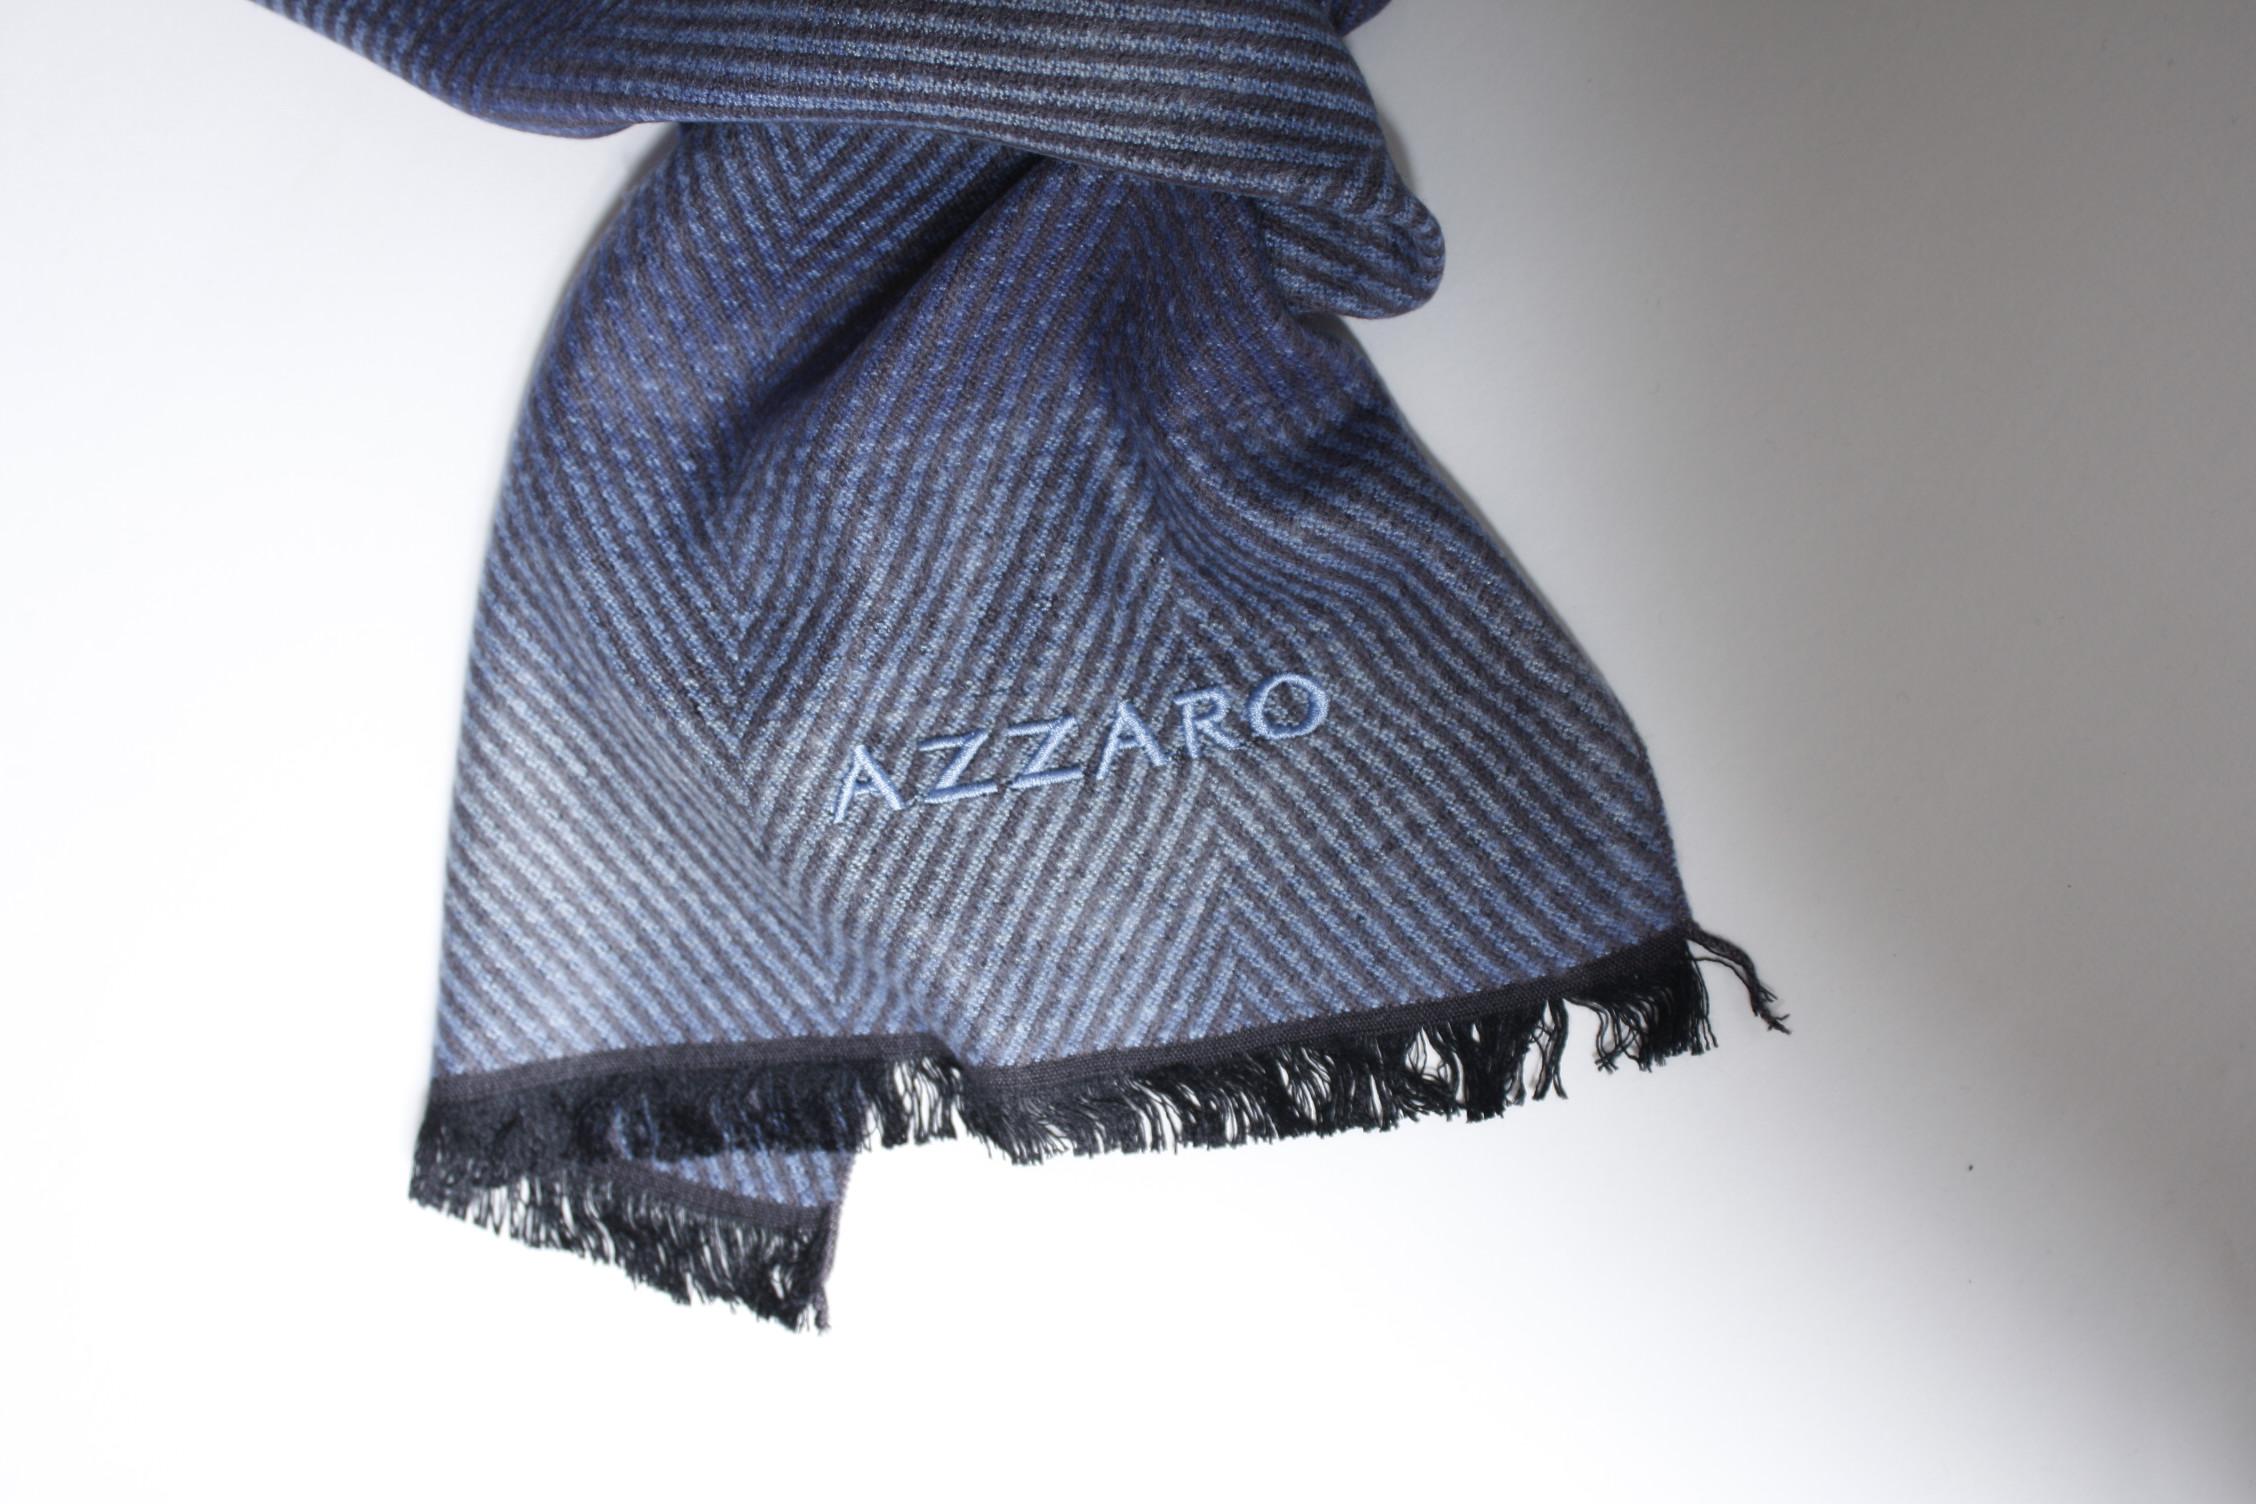 Echarpe azzaro - Diya.fr cb4d55768d5